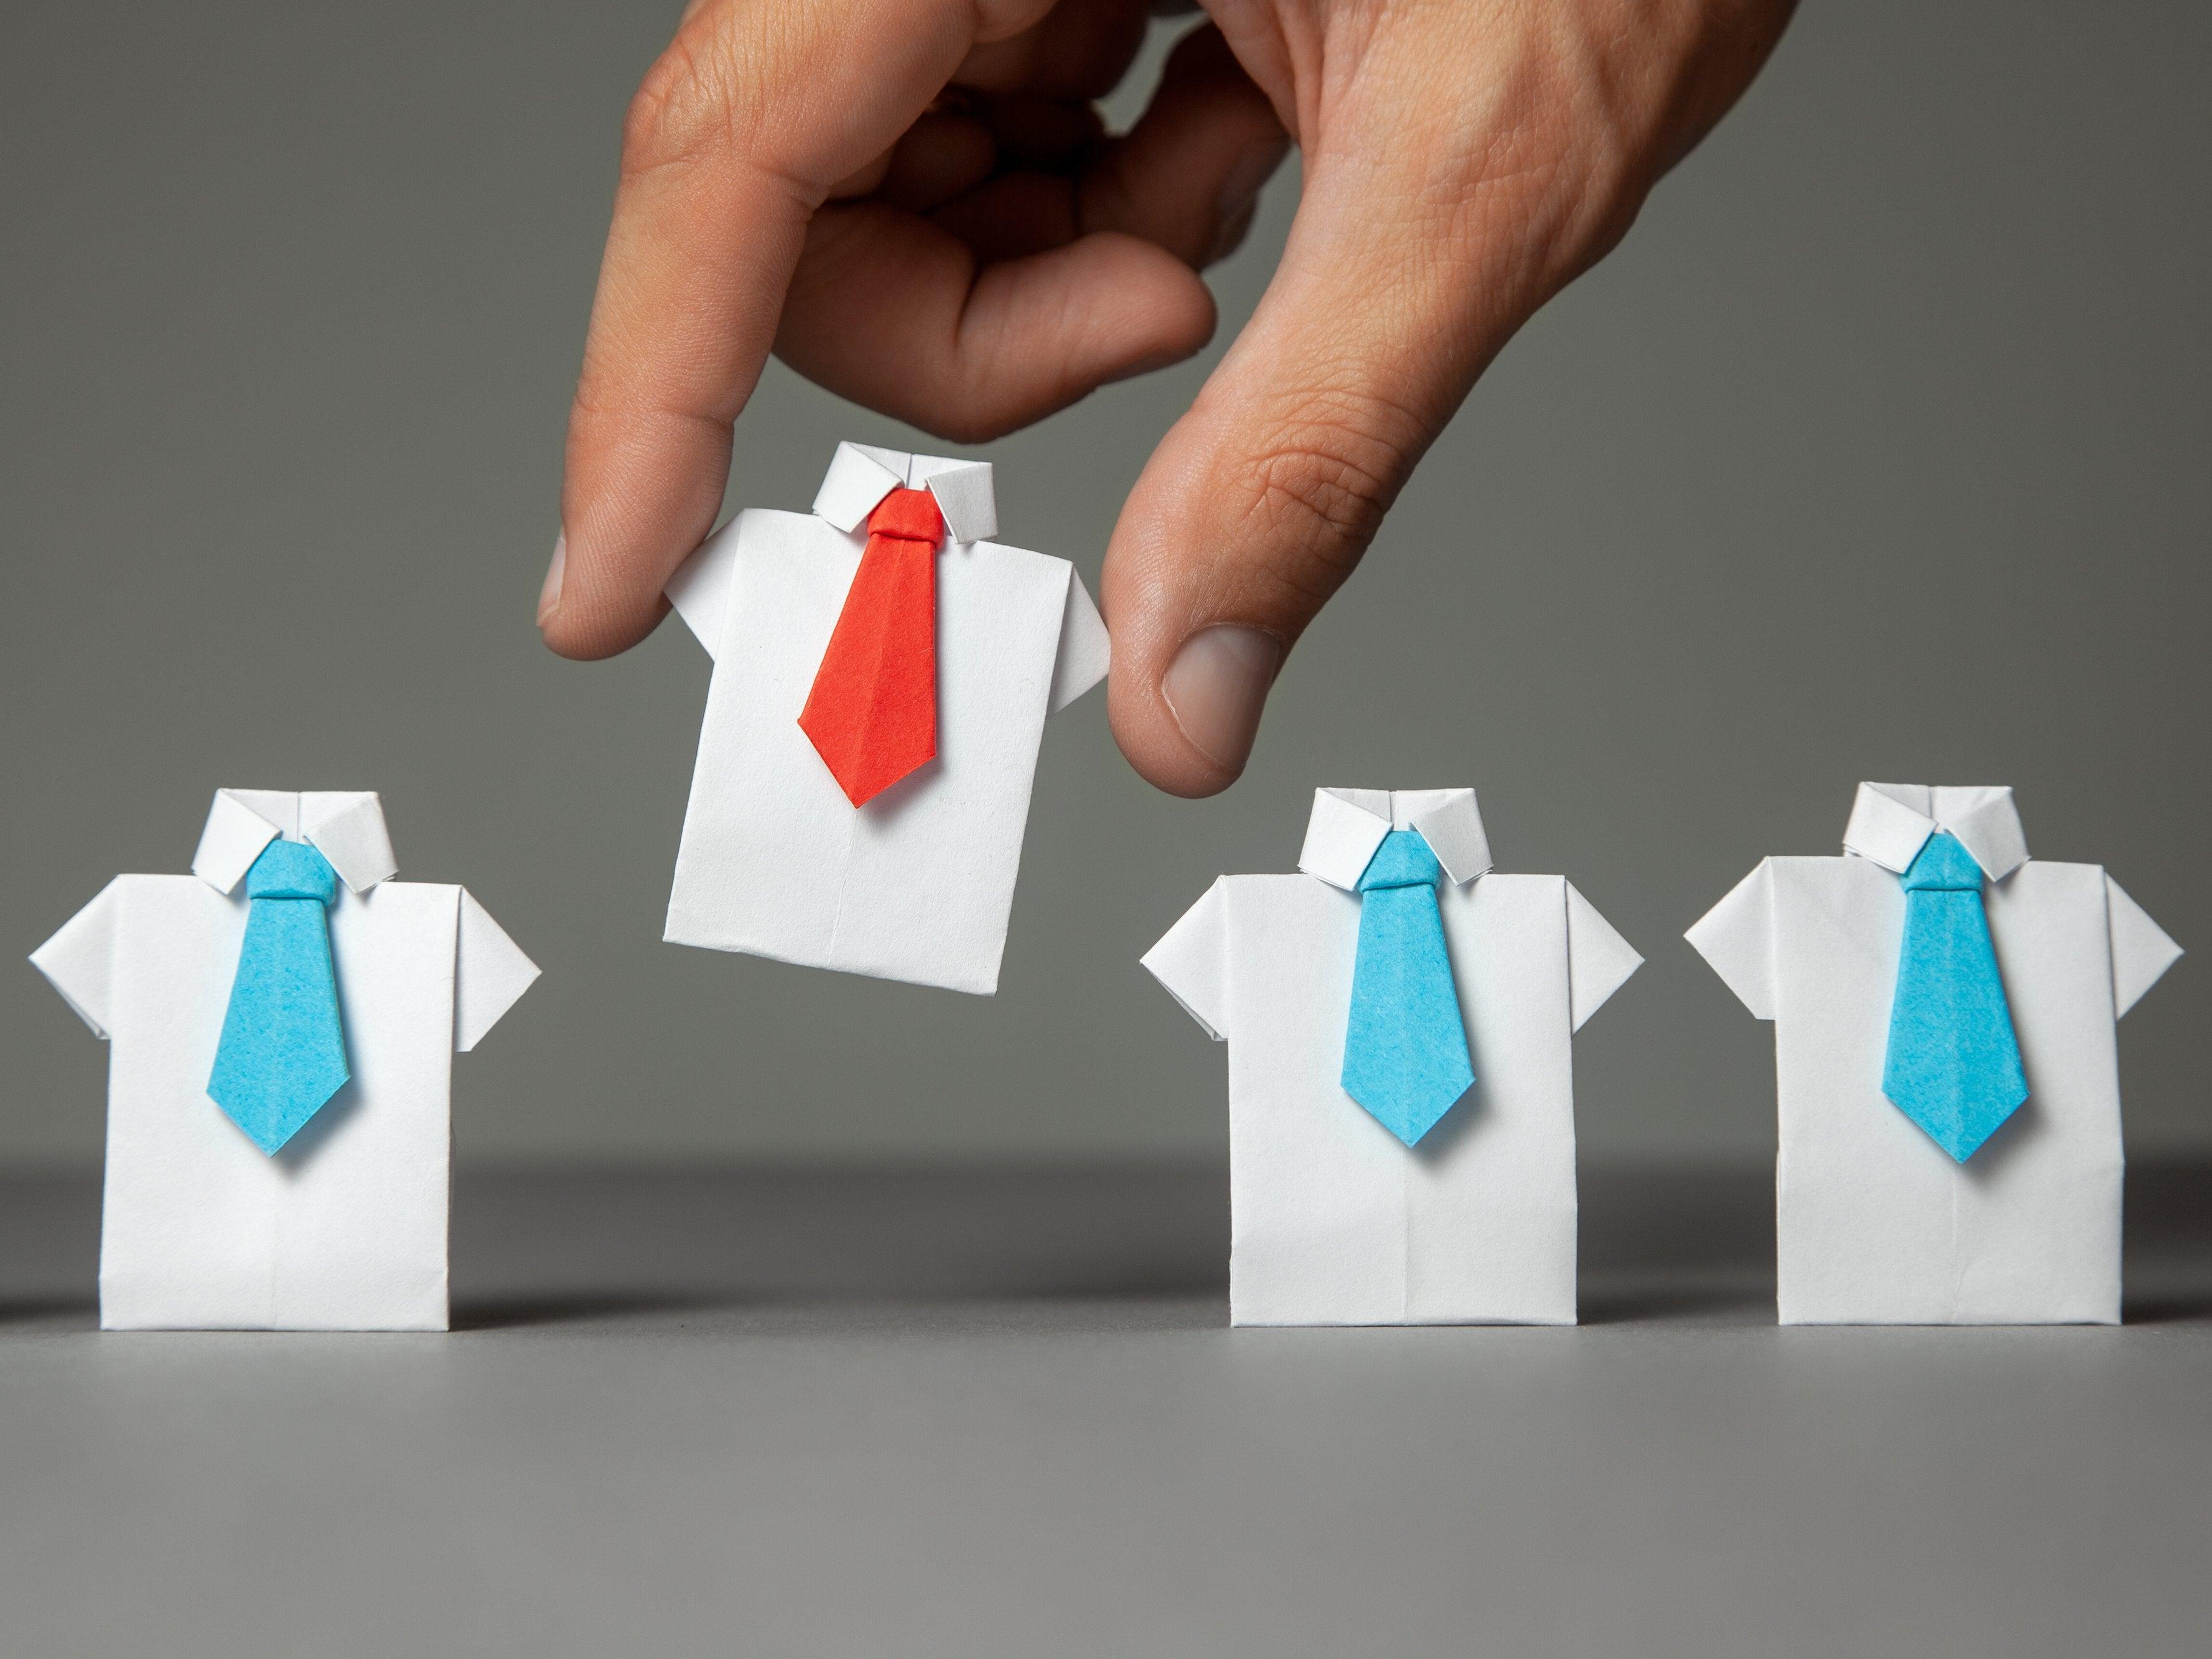 Considering redundancies? Key legal requirements to ensure a genuine redundancy